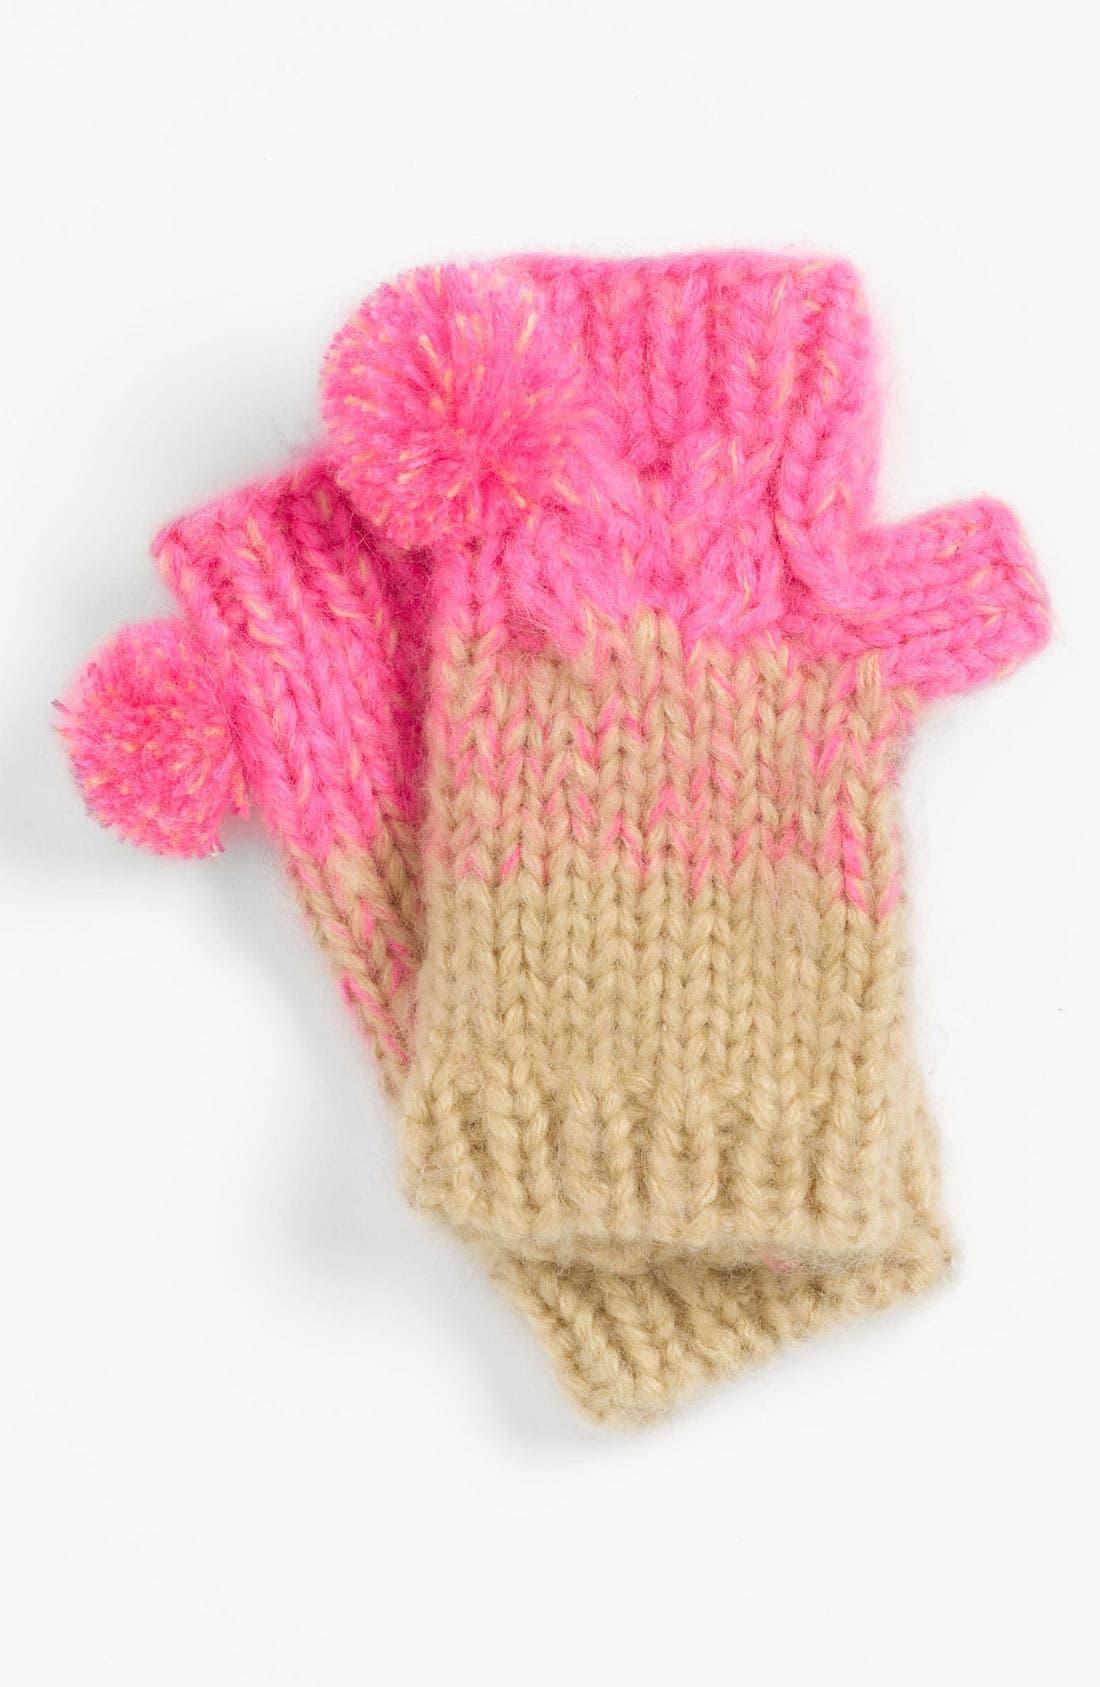 Main Image - Peace of Cake 'Pigtail' Fingerless Gloves (Girls)